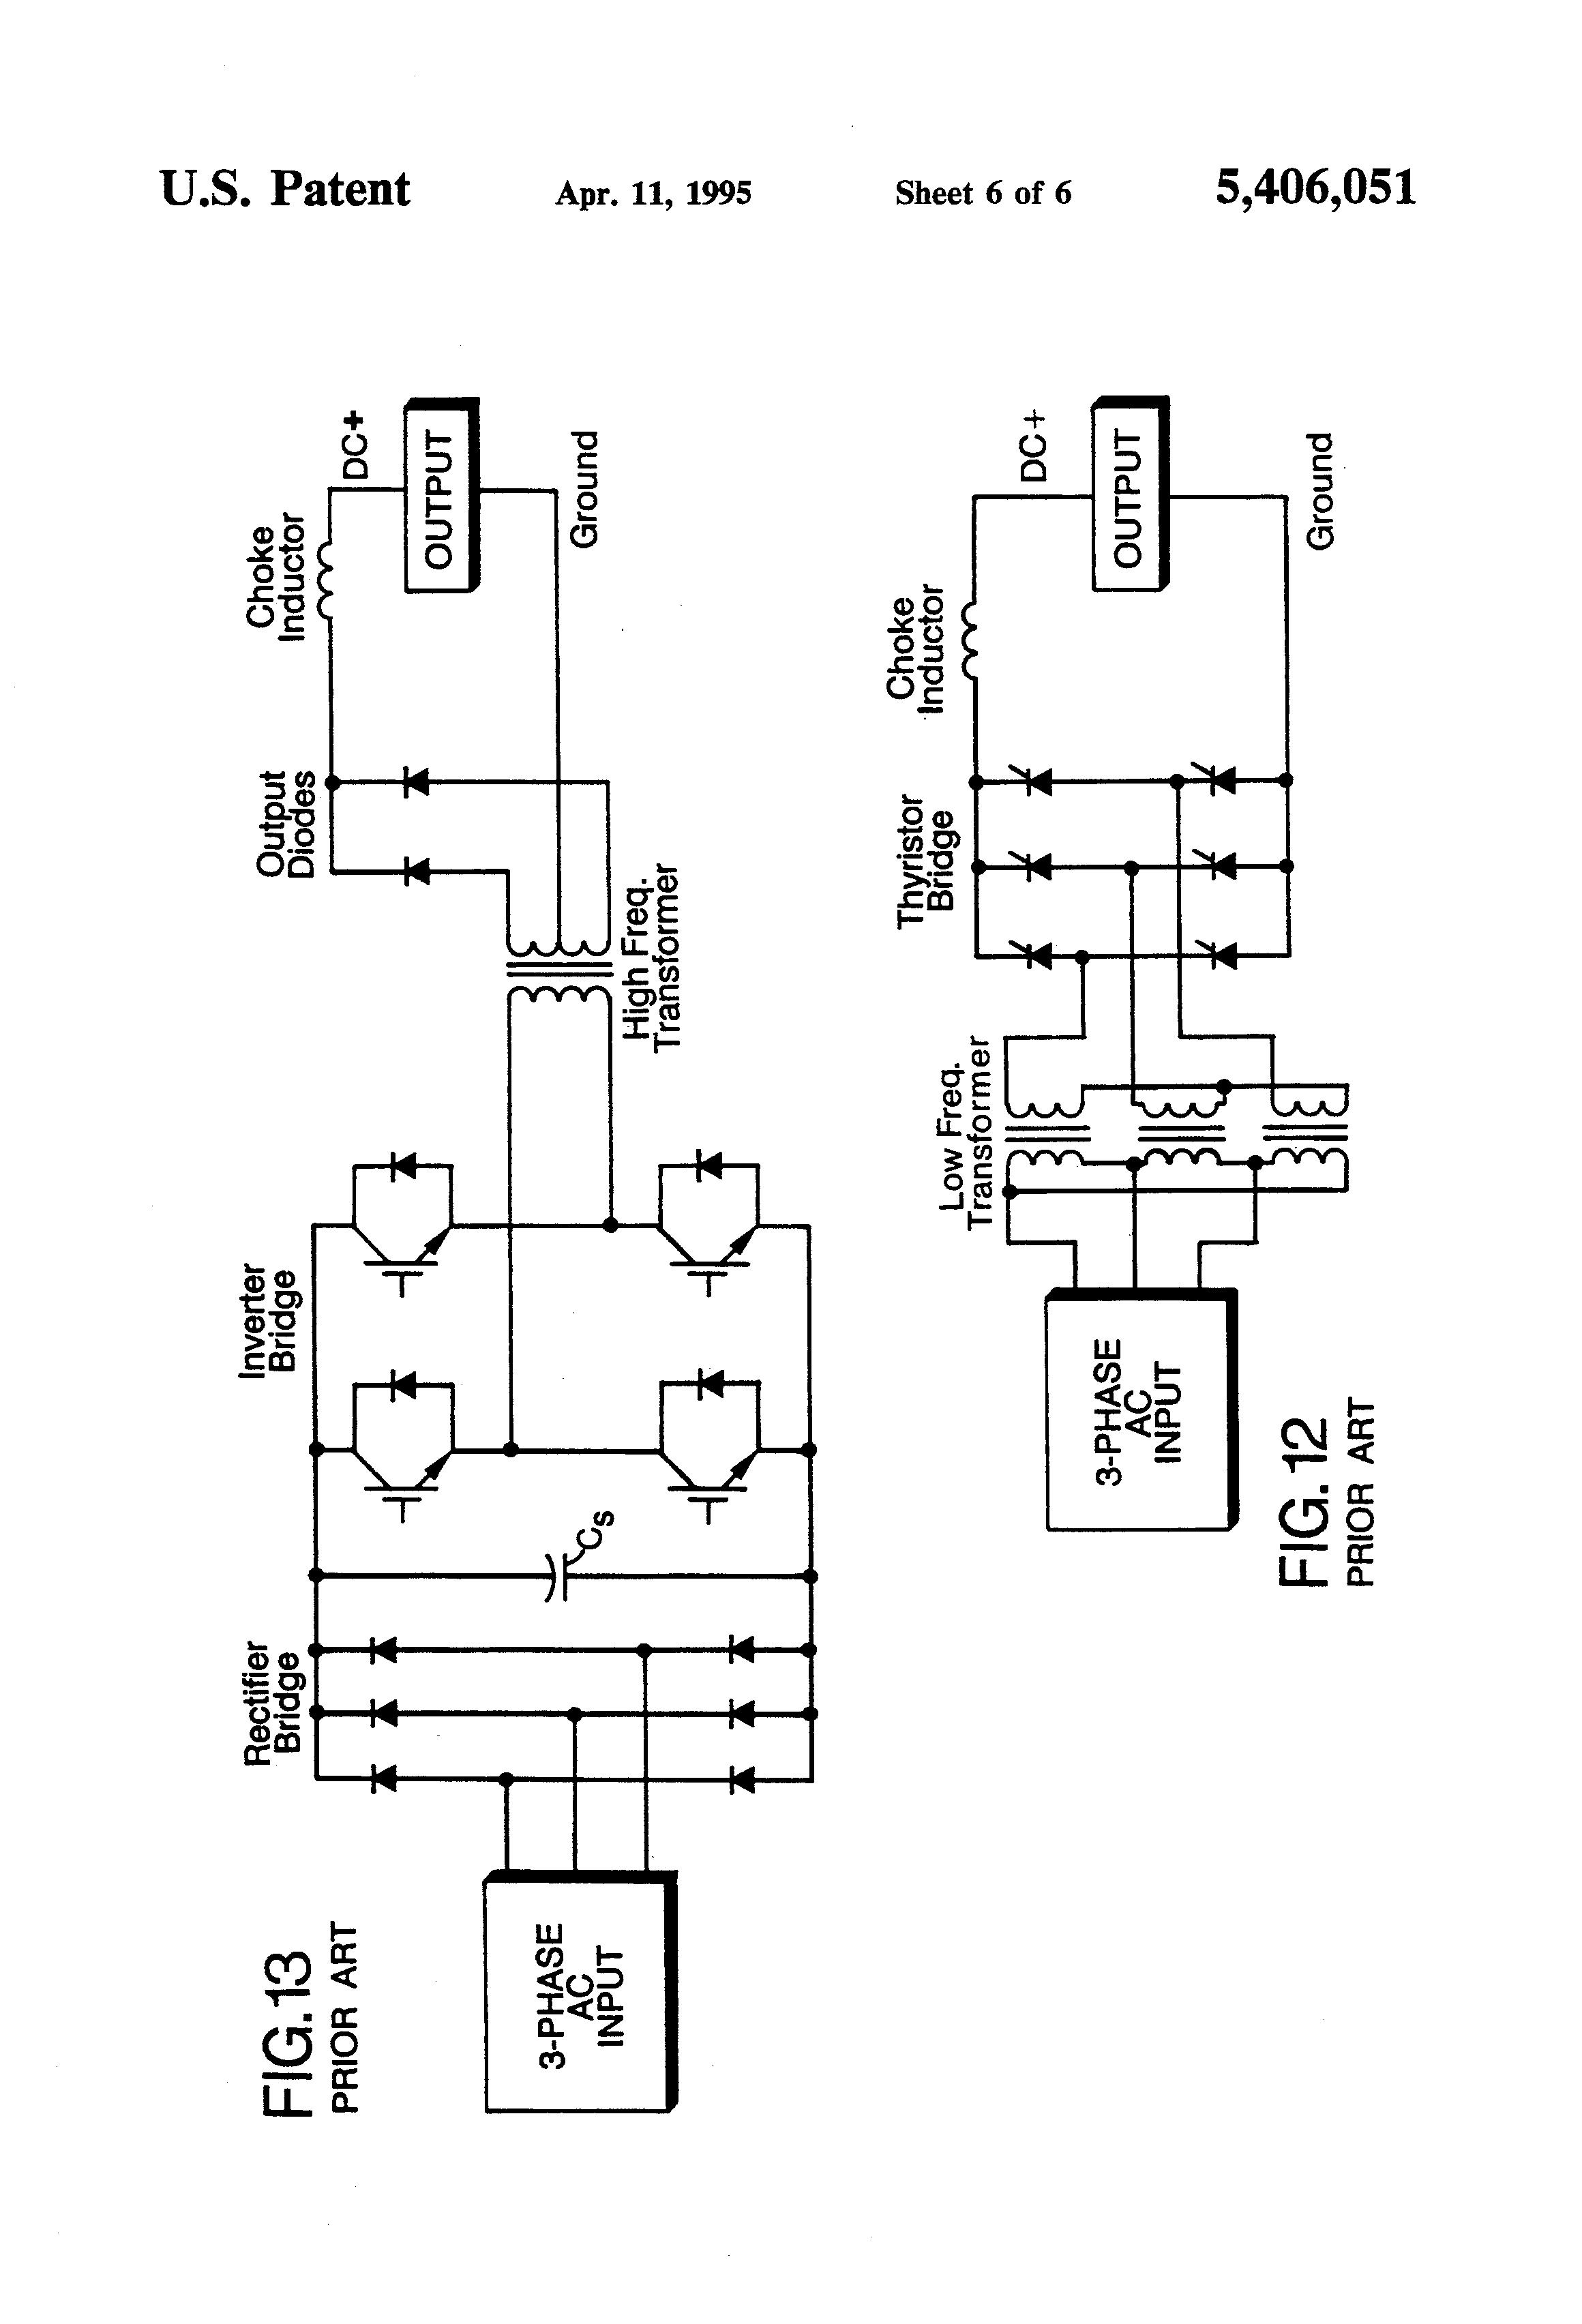 3 Phase Welding Machine Diagram Wiring Diagrams Welder Circuit 39 Rectifier Parts Of